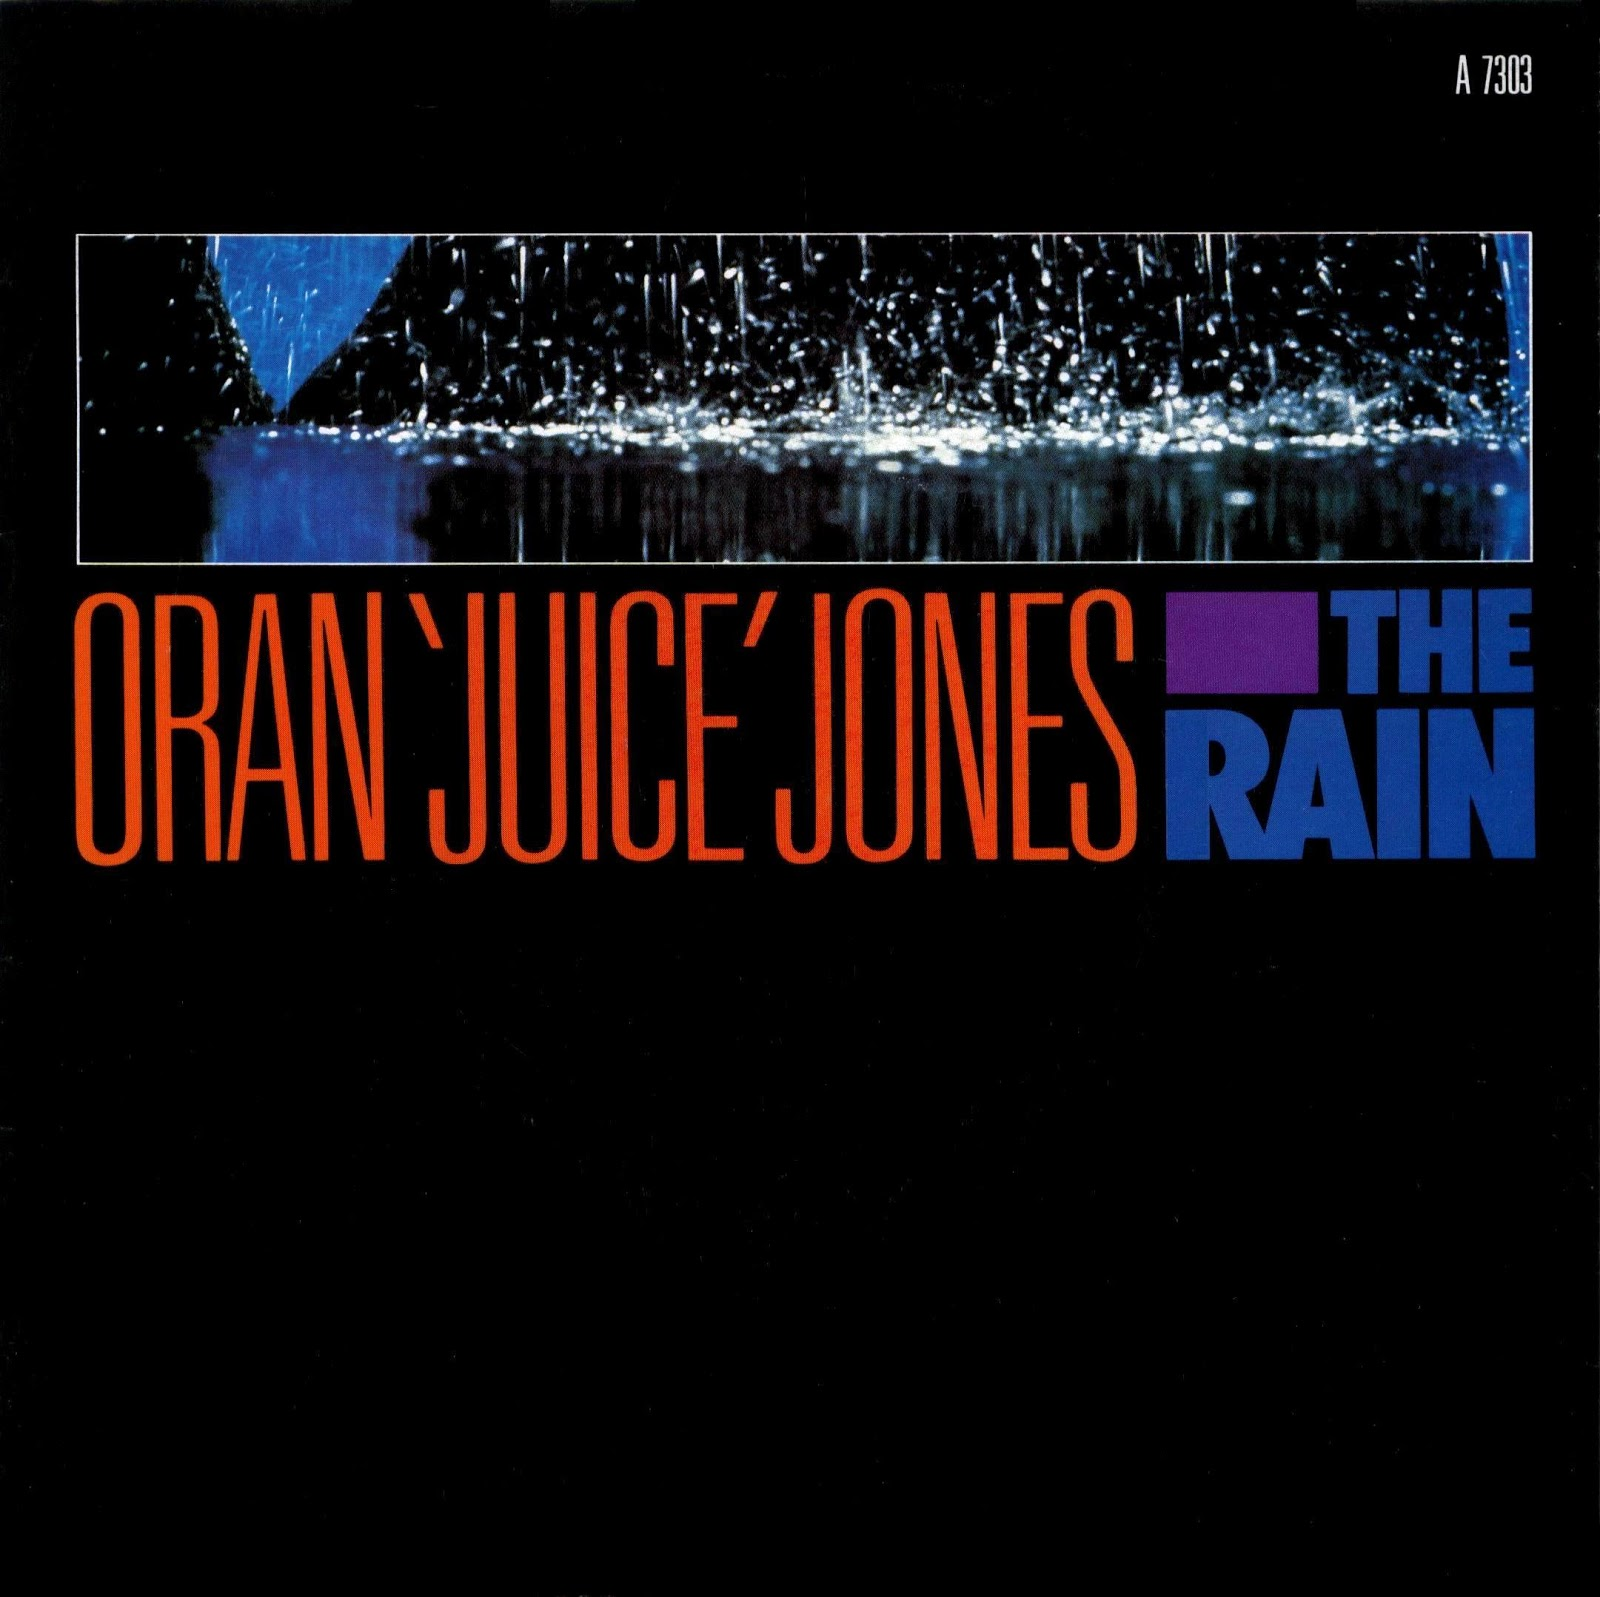 Oran Juice Jones Rain on My Five Senses